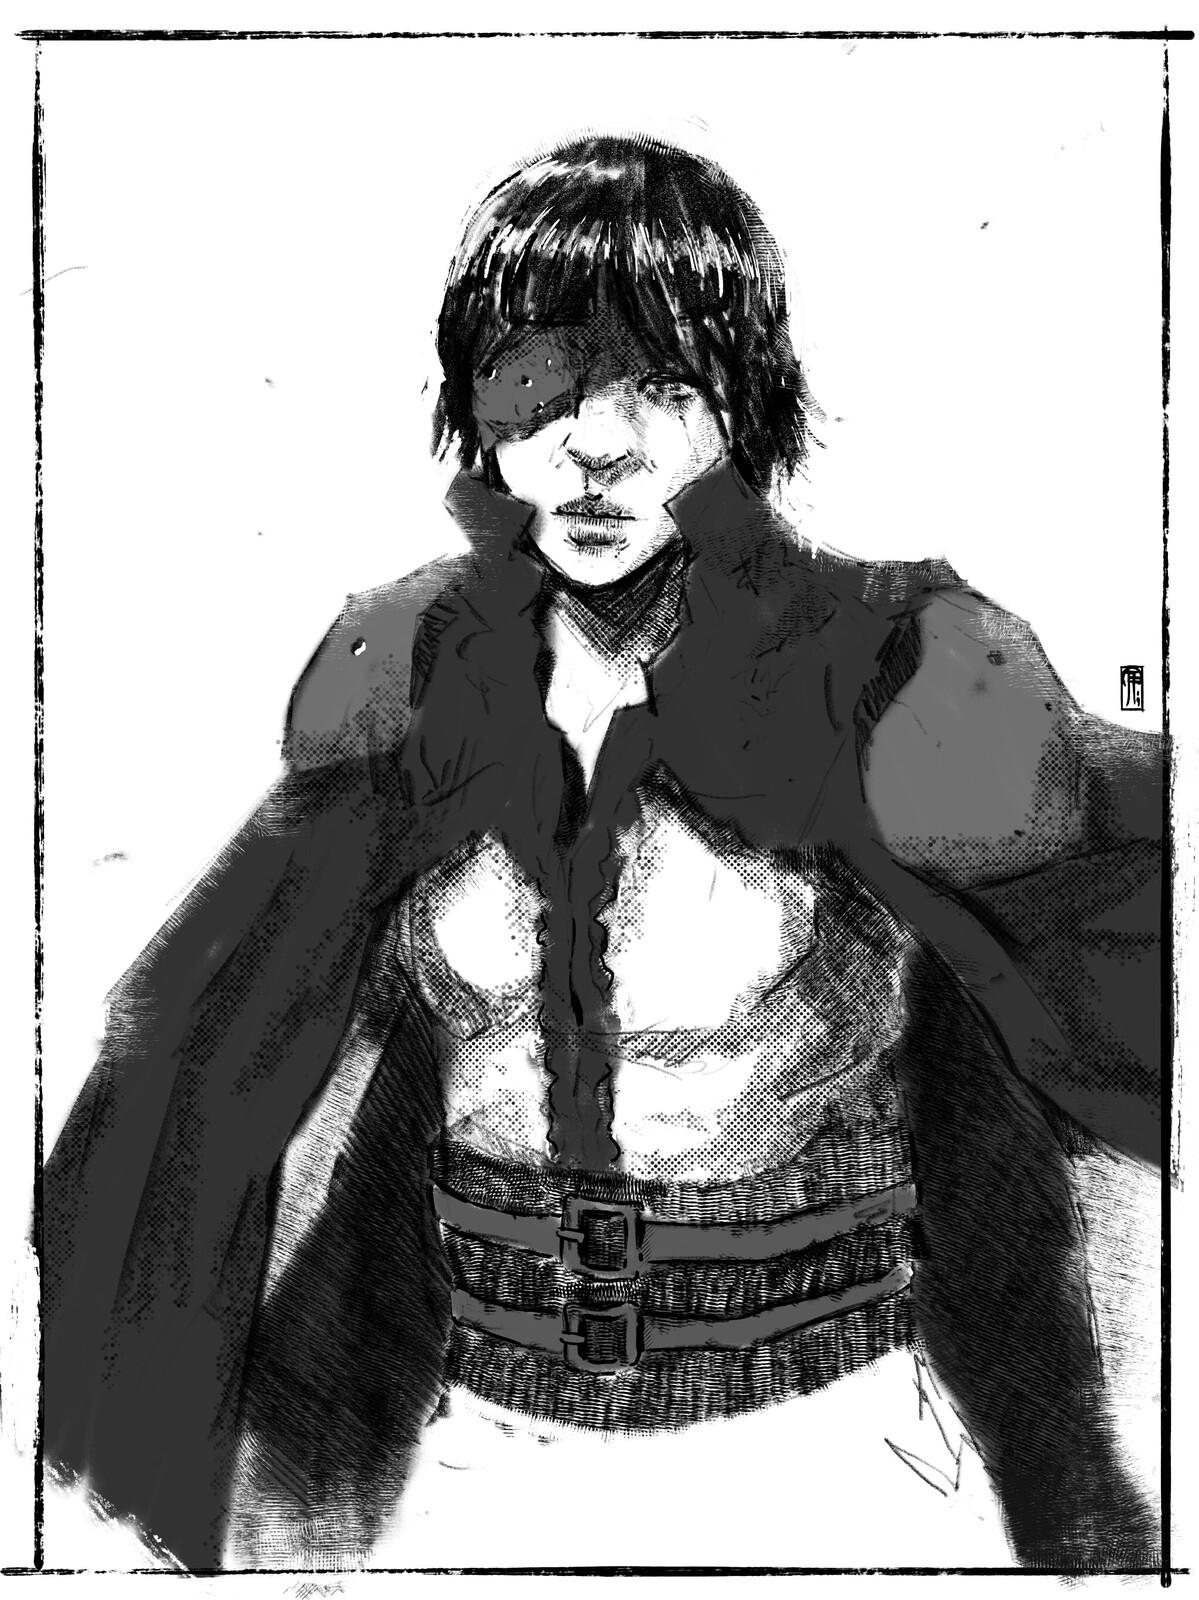 Doodling//Steampunk lady duelist